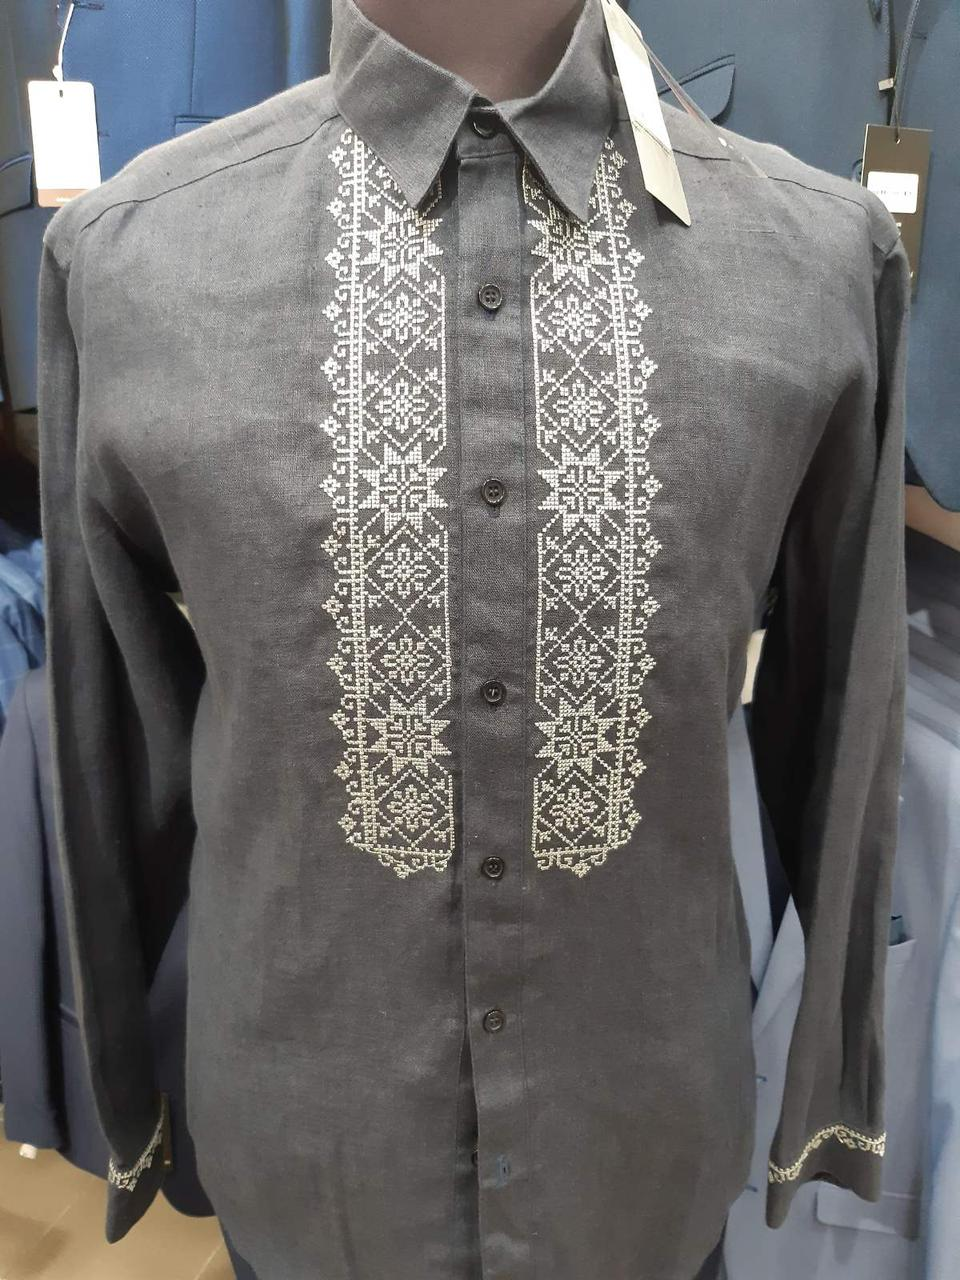 Рубашка-вышиванка Petro Soroka модель МТ 2064-07 синяя